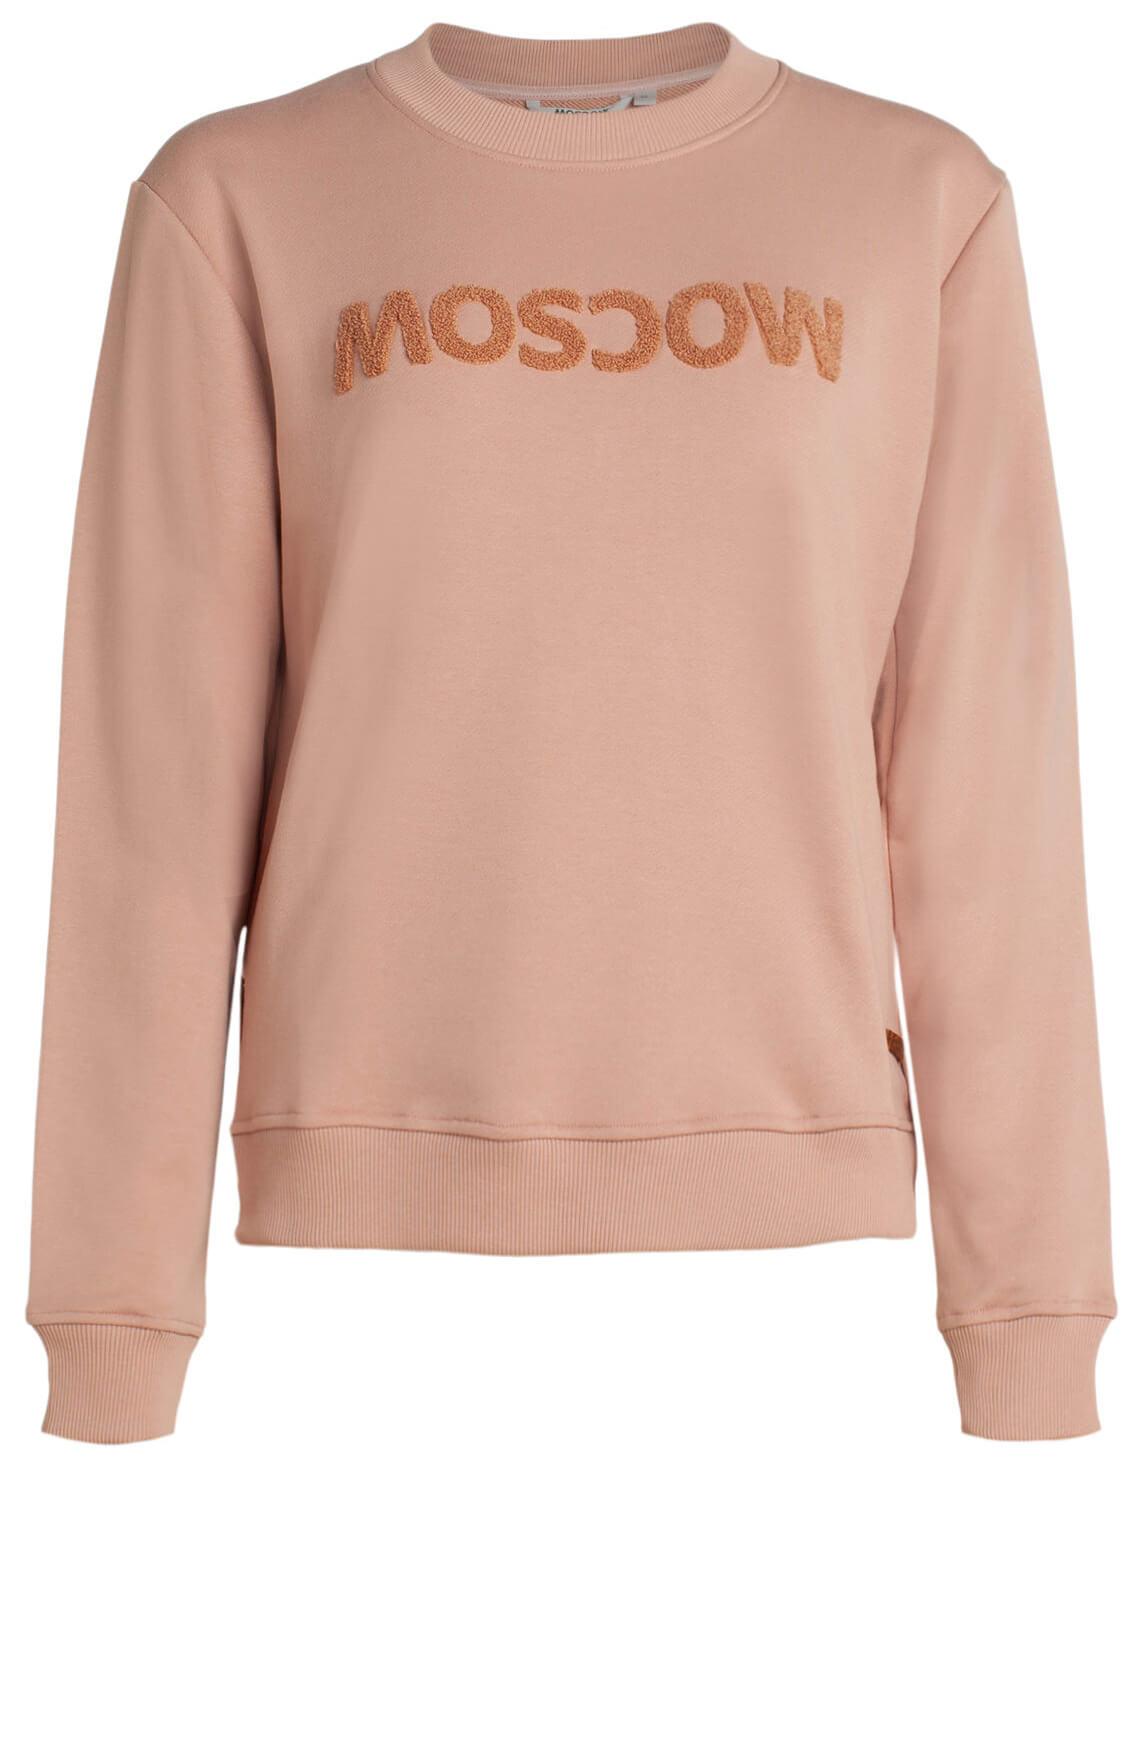 Moscow Dames Sweater met logo opdruk roze